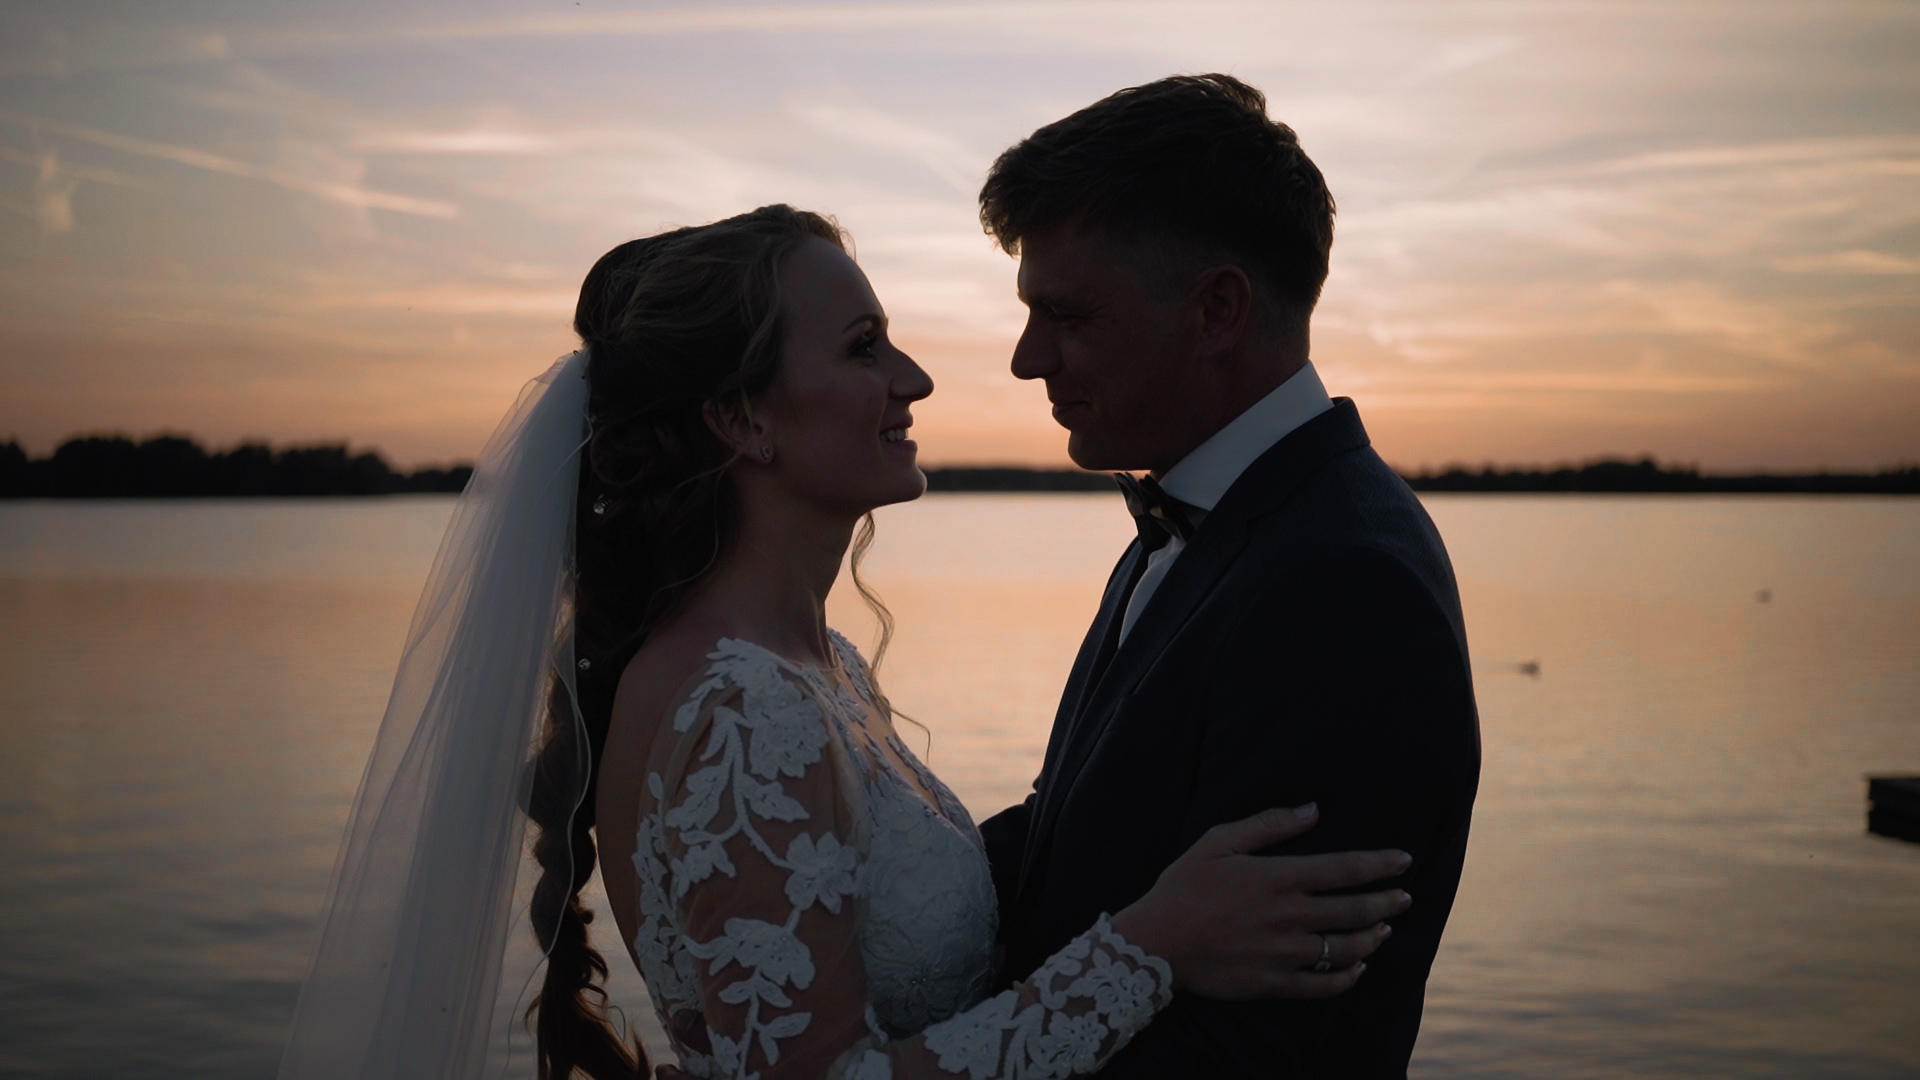 Bruiloftsfilm van Sharon & JP - The Best of Times Films